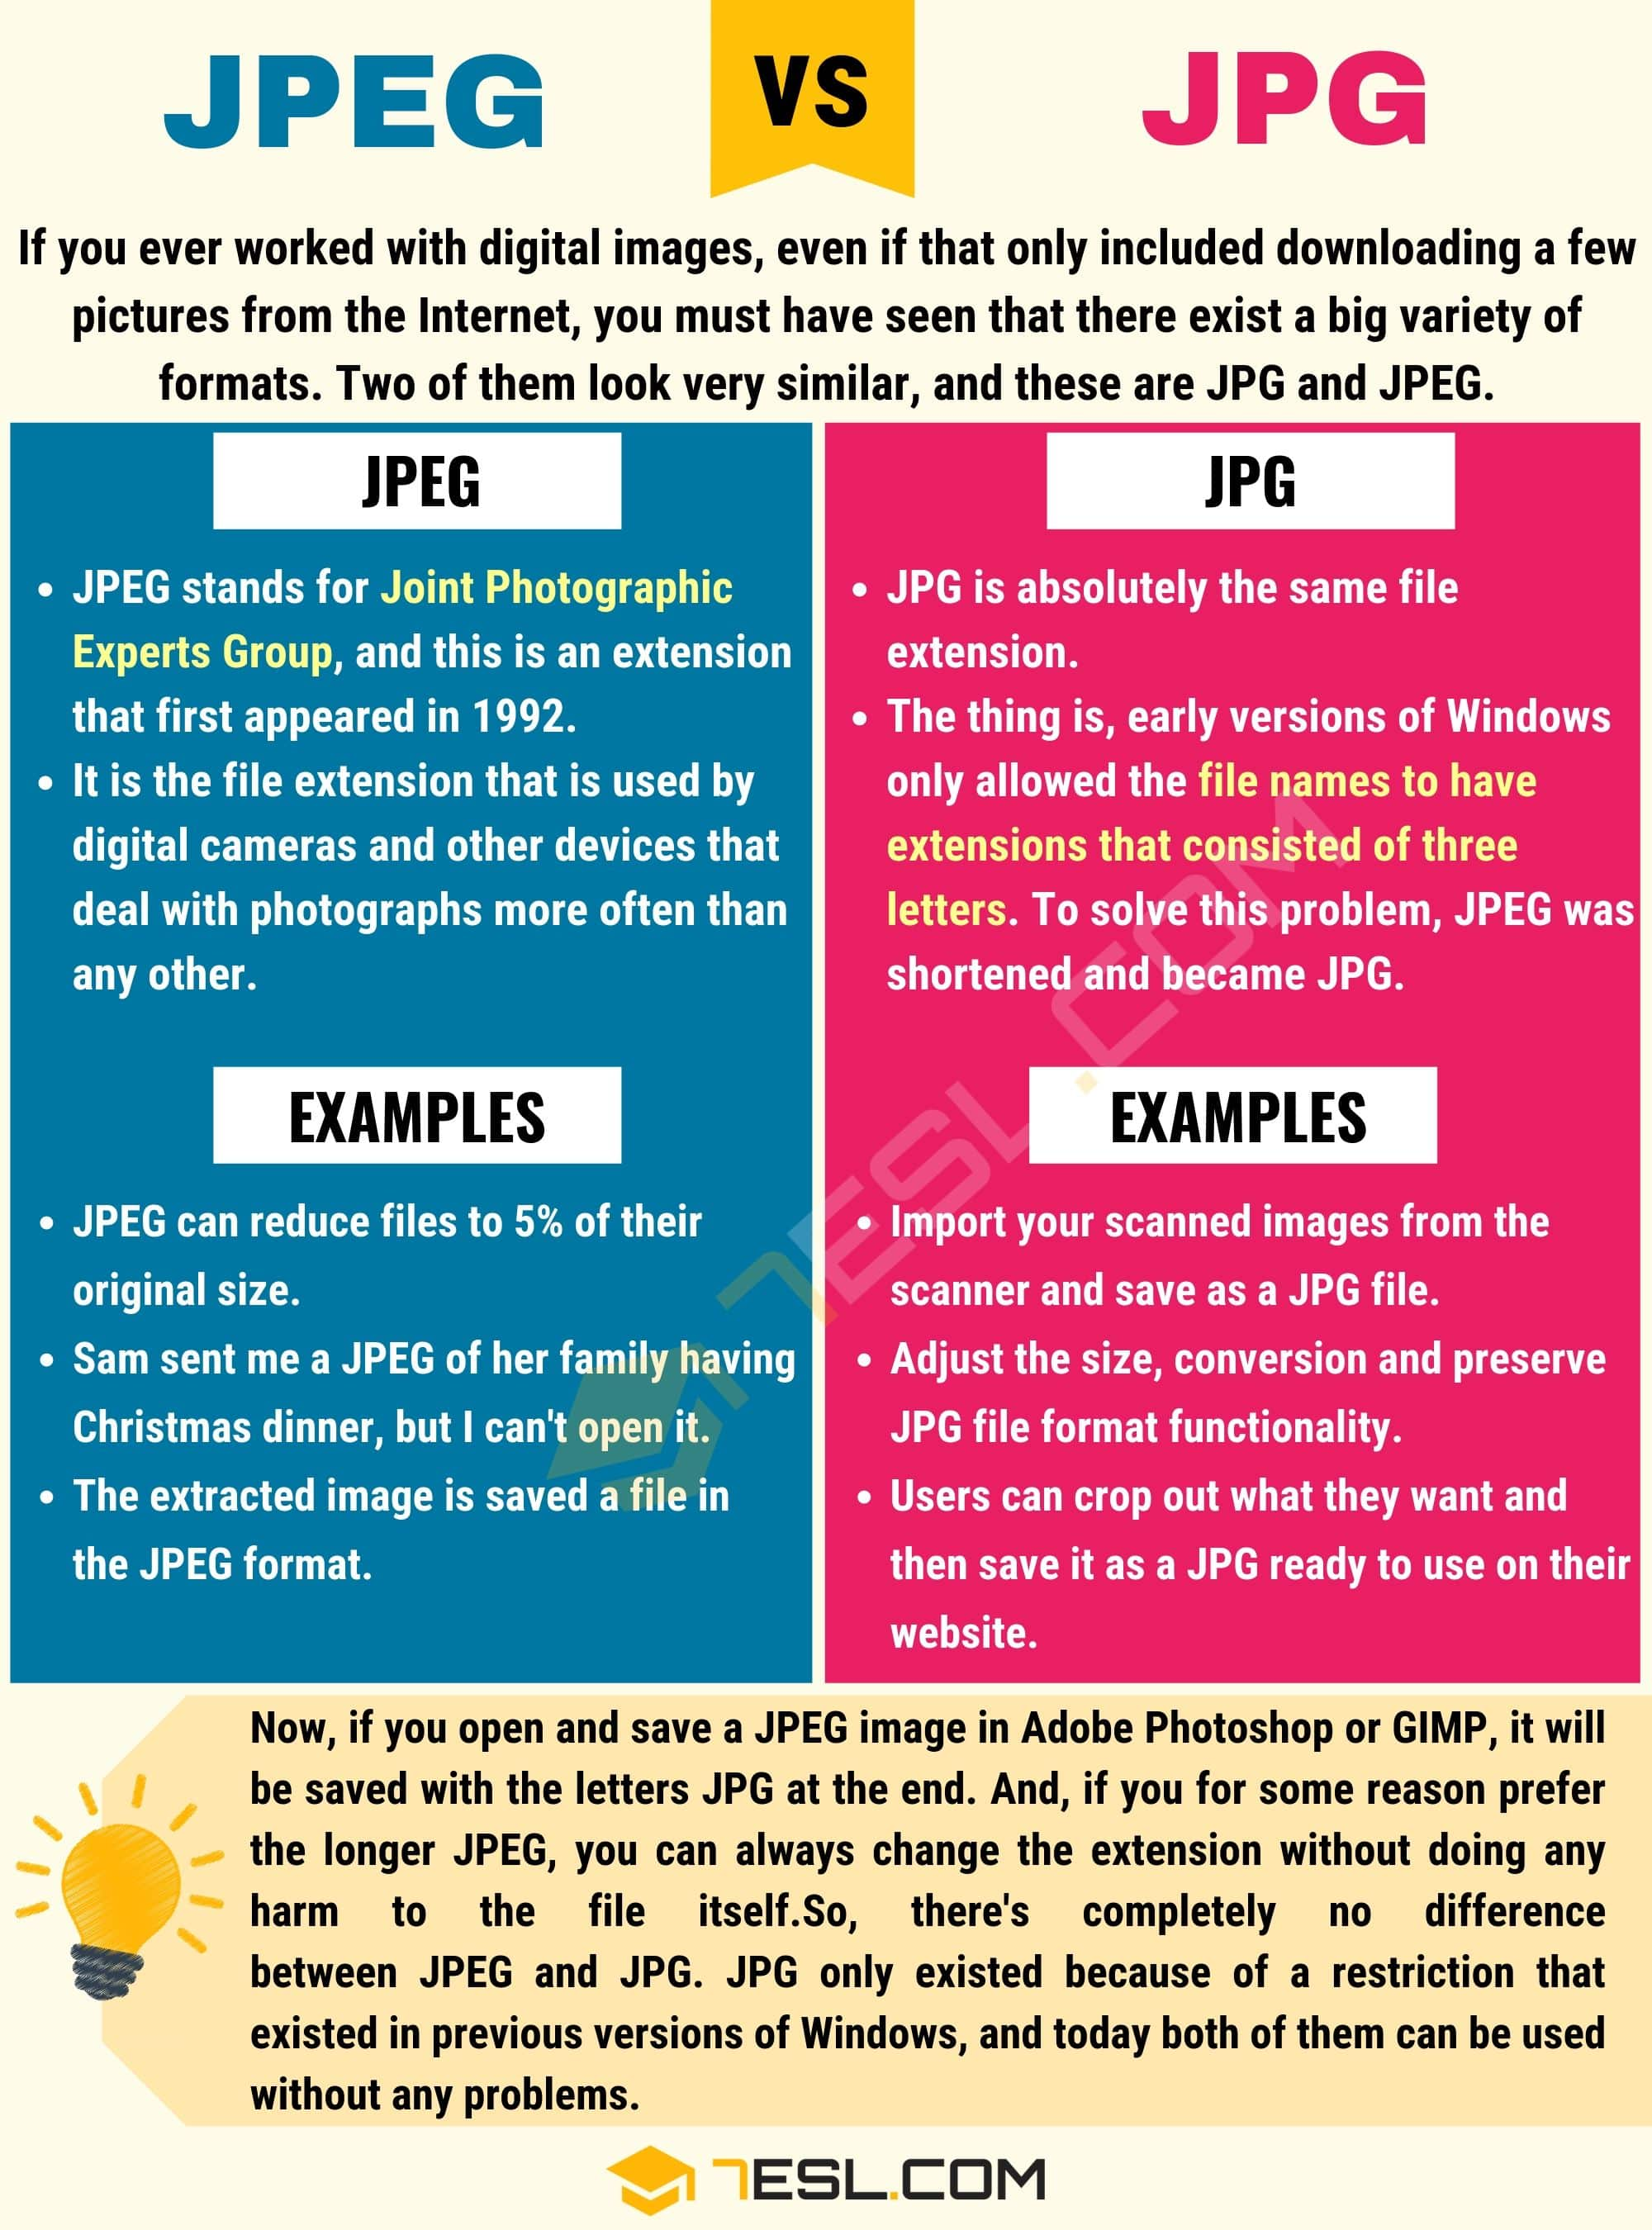 JPG Vs JPEG: Useful Difference Between JPEG Vs JPG - 7 E S L